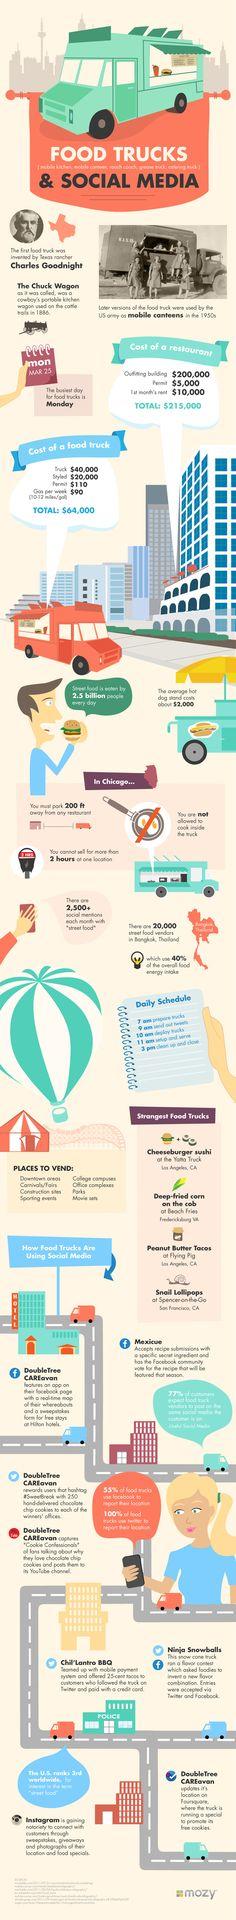 Food trucks & Social Media #infografia #infographic #socialmedia